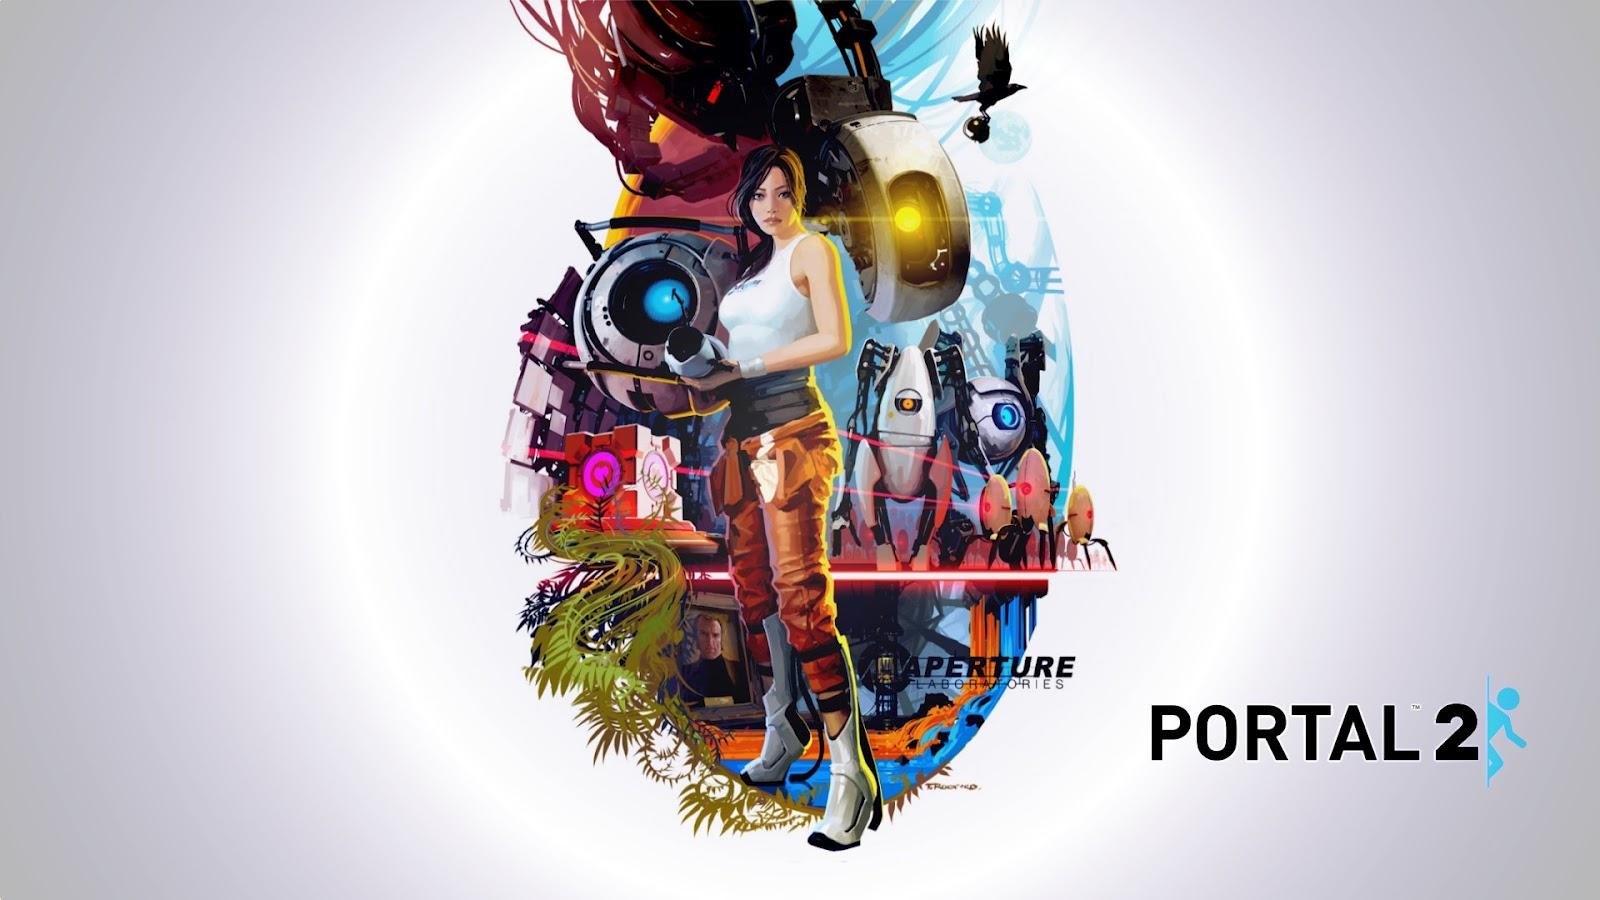 wallpaper: portal 2 wallpapers 1080p